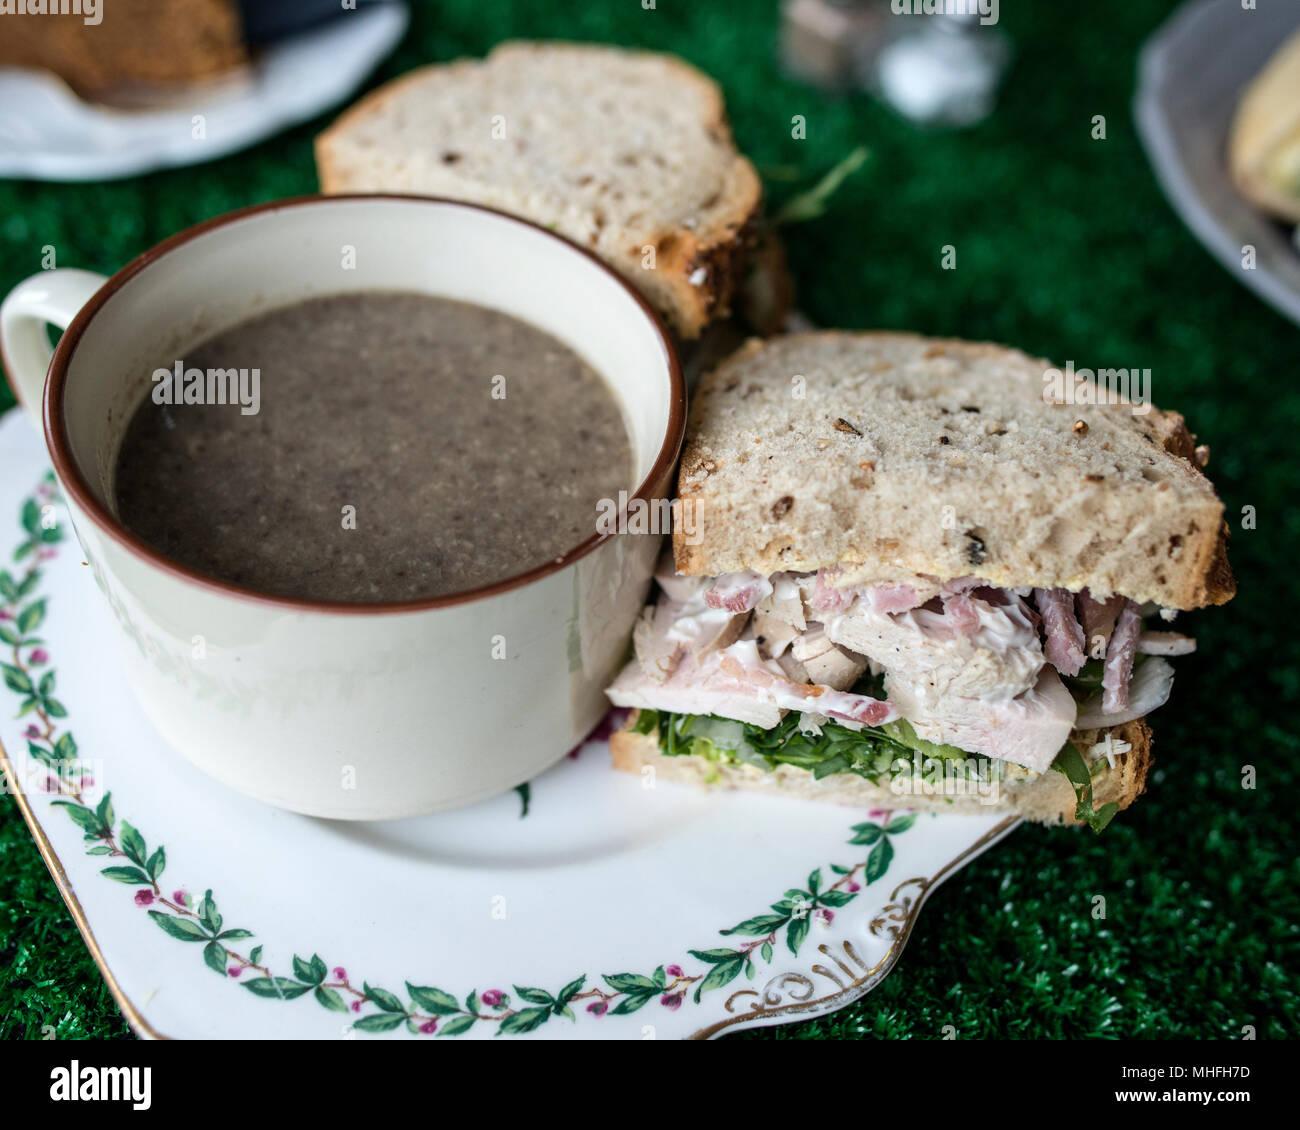 Rustic Mushroom Soup and Chicken Sandiwch - Stock Image